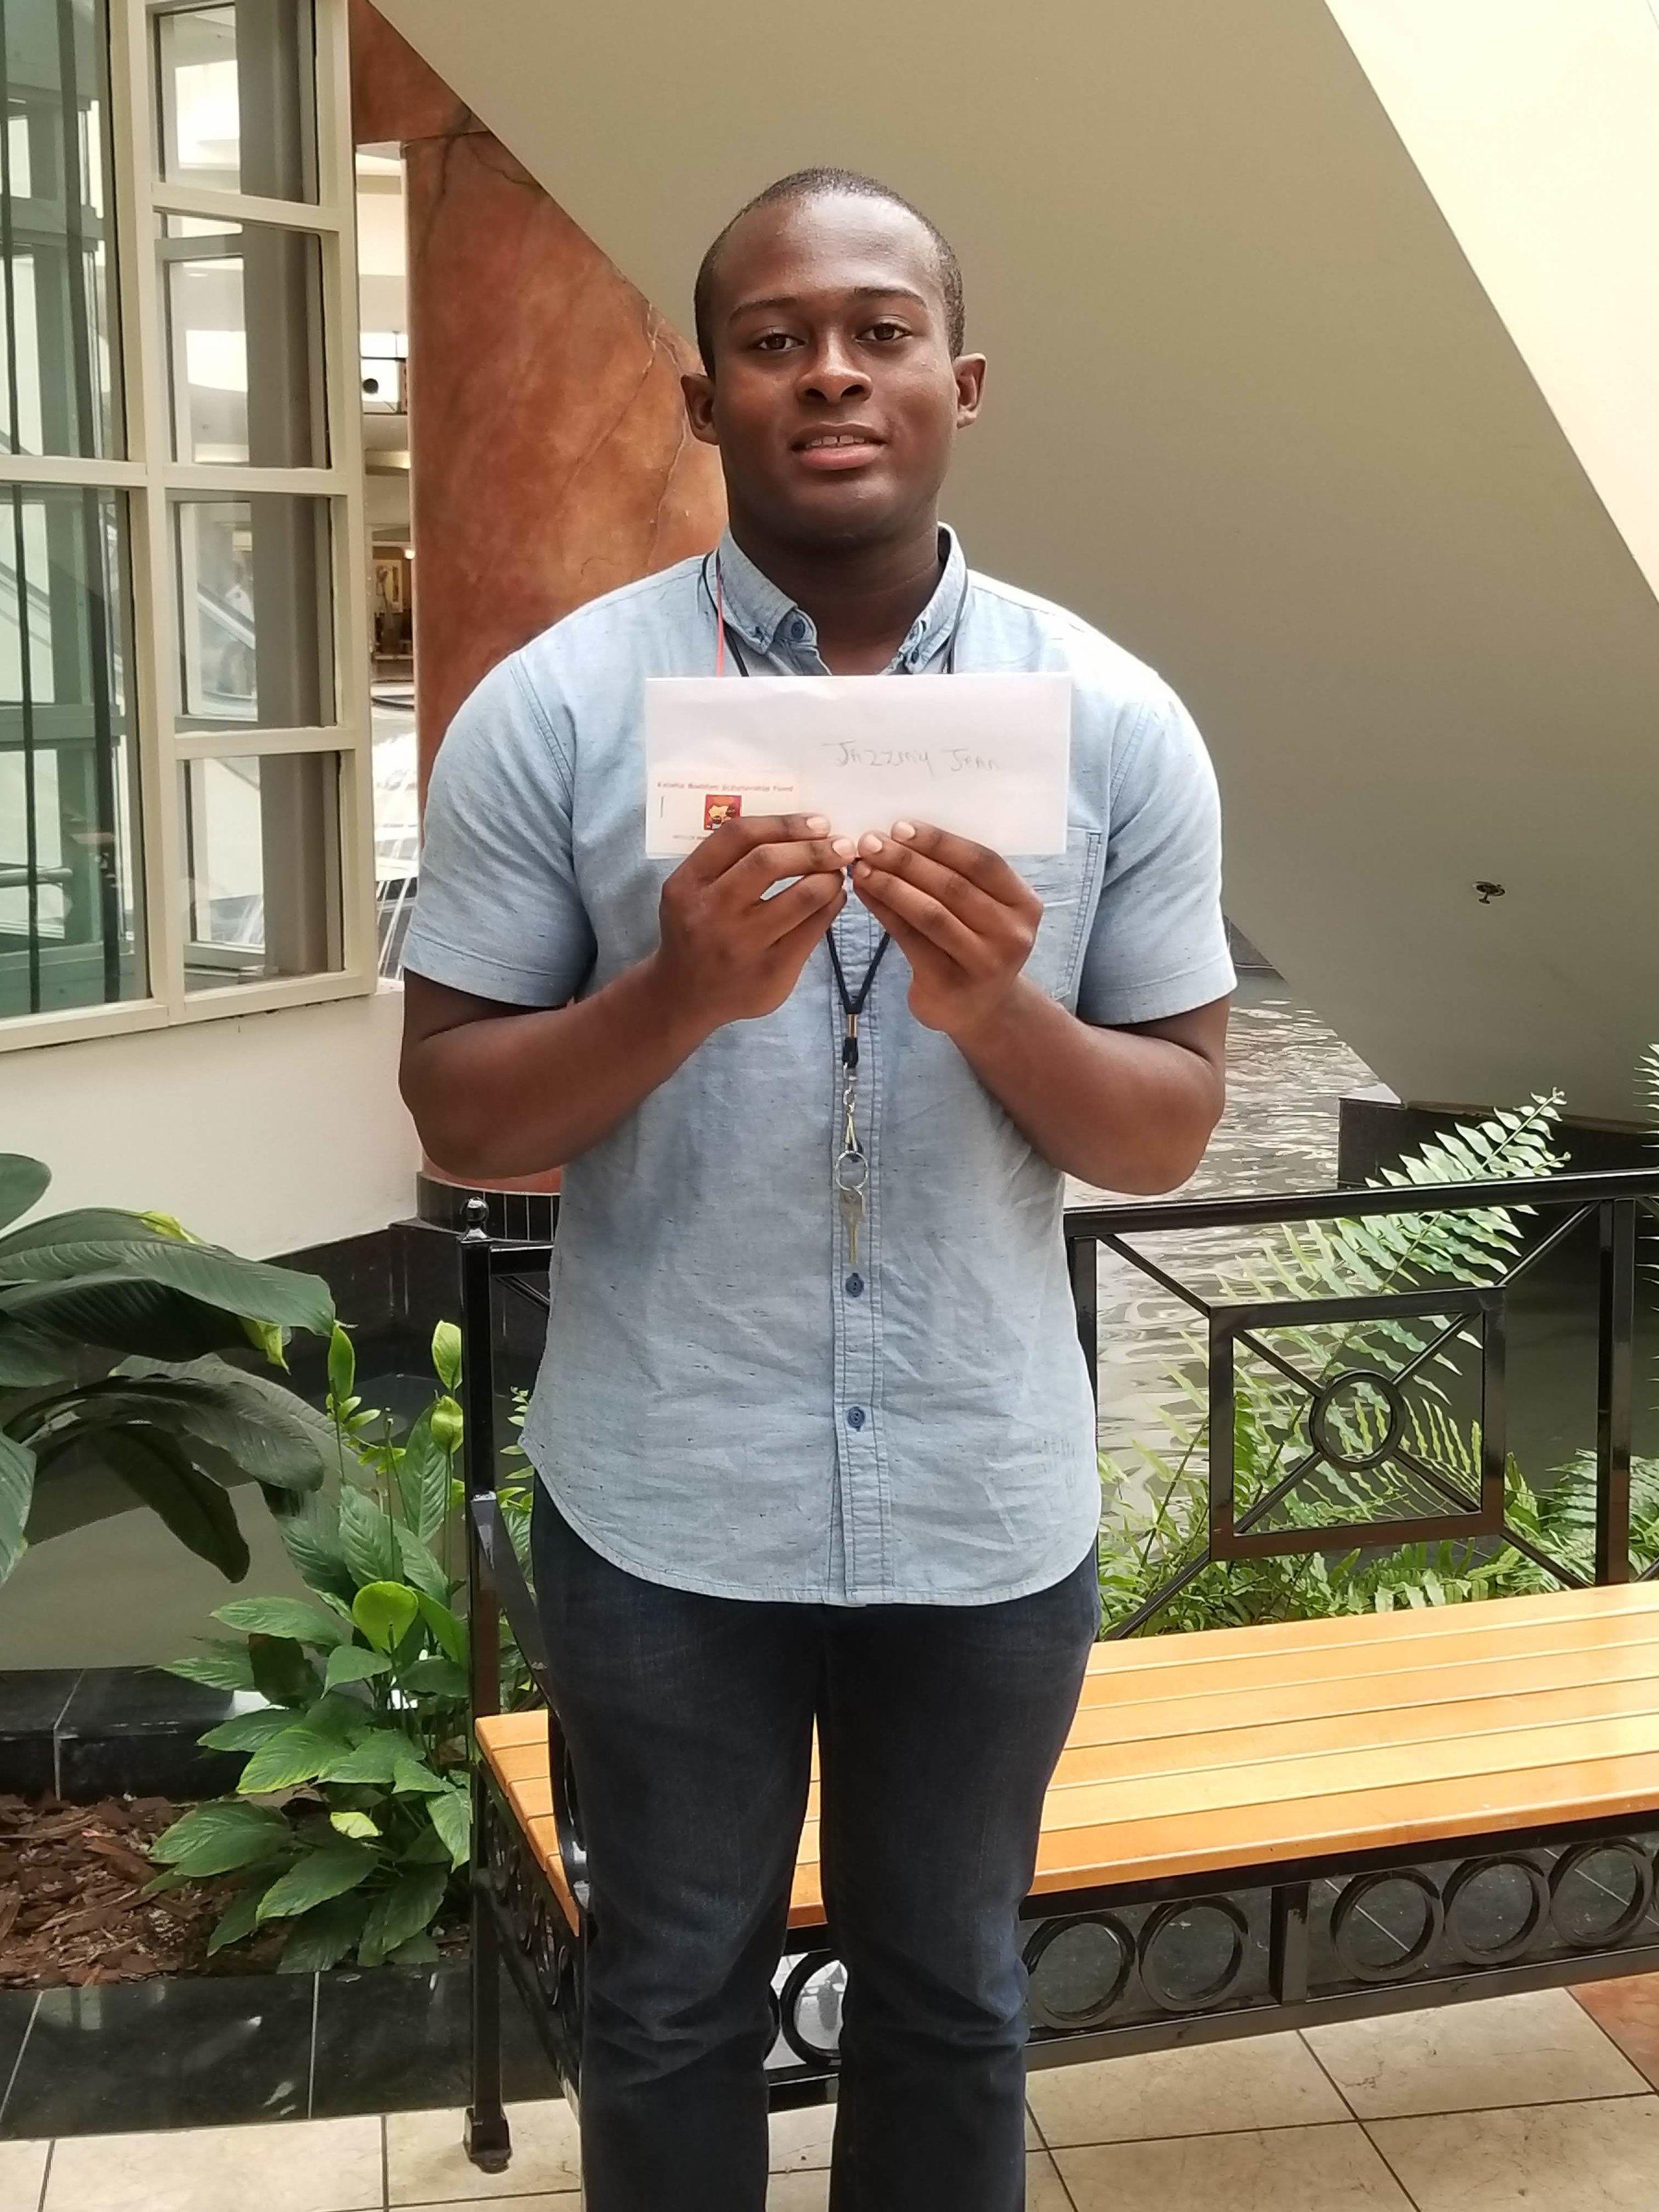 2018 Keisha Bodden Scholarship Recipient